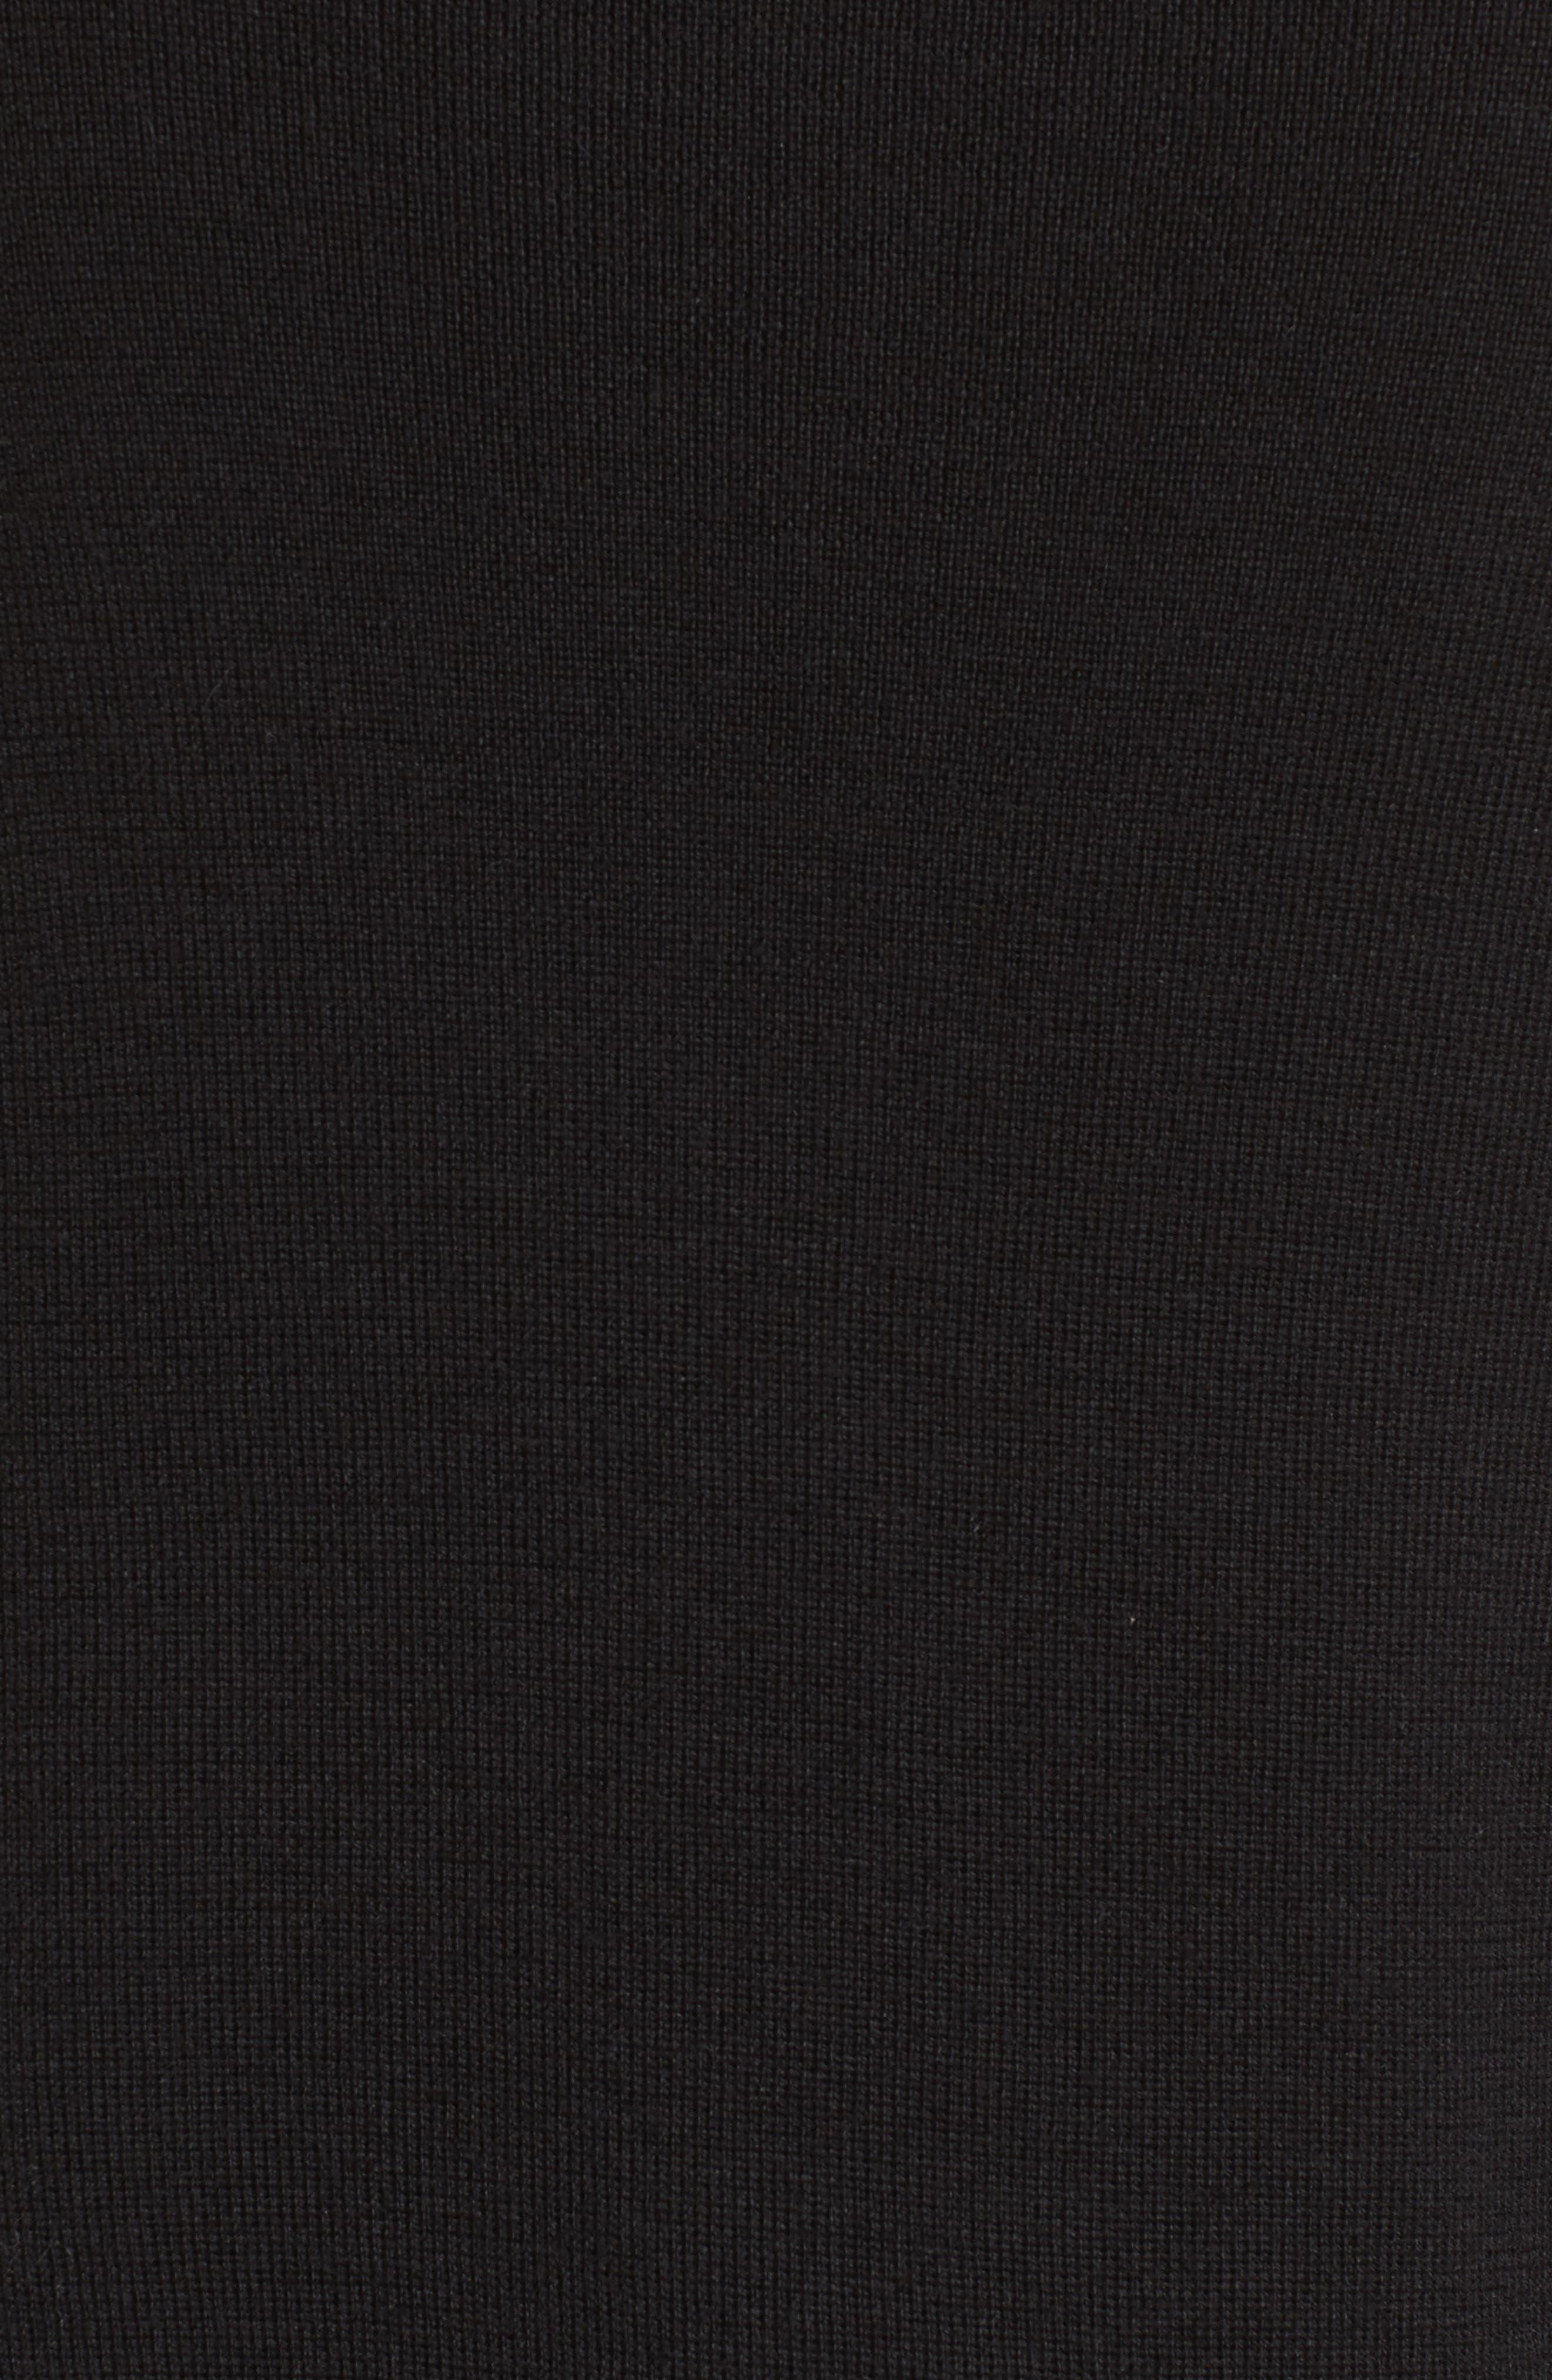 Ruffle Crewneck Sweater,                             Alternate thumbnail 5, color,                             001